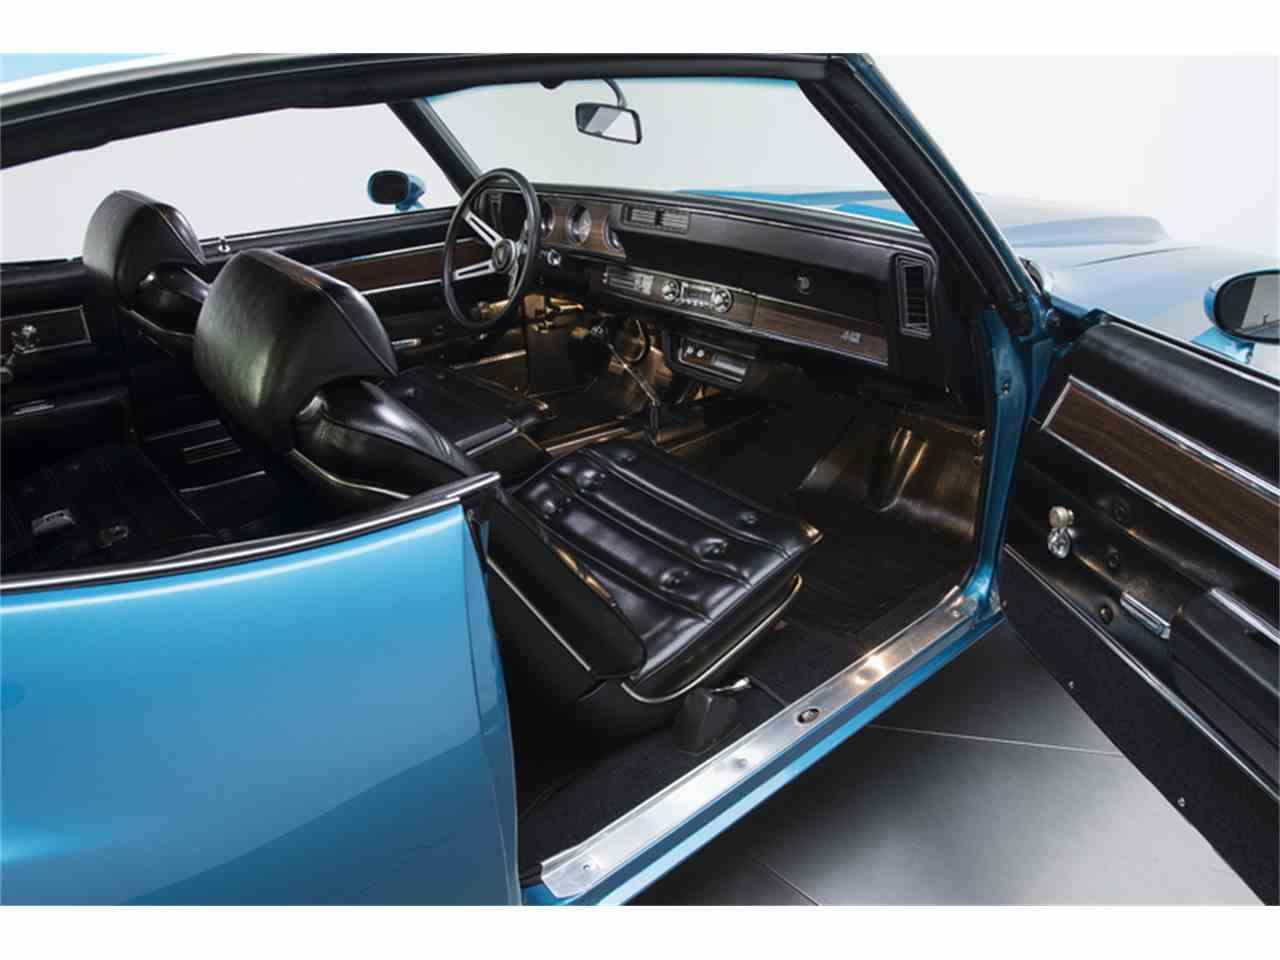 Large Picture of Classic 1971 Oldsmobile 442 located in North Carolina - $104,900.00 - IKOQ